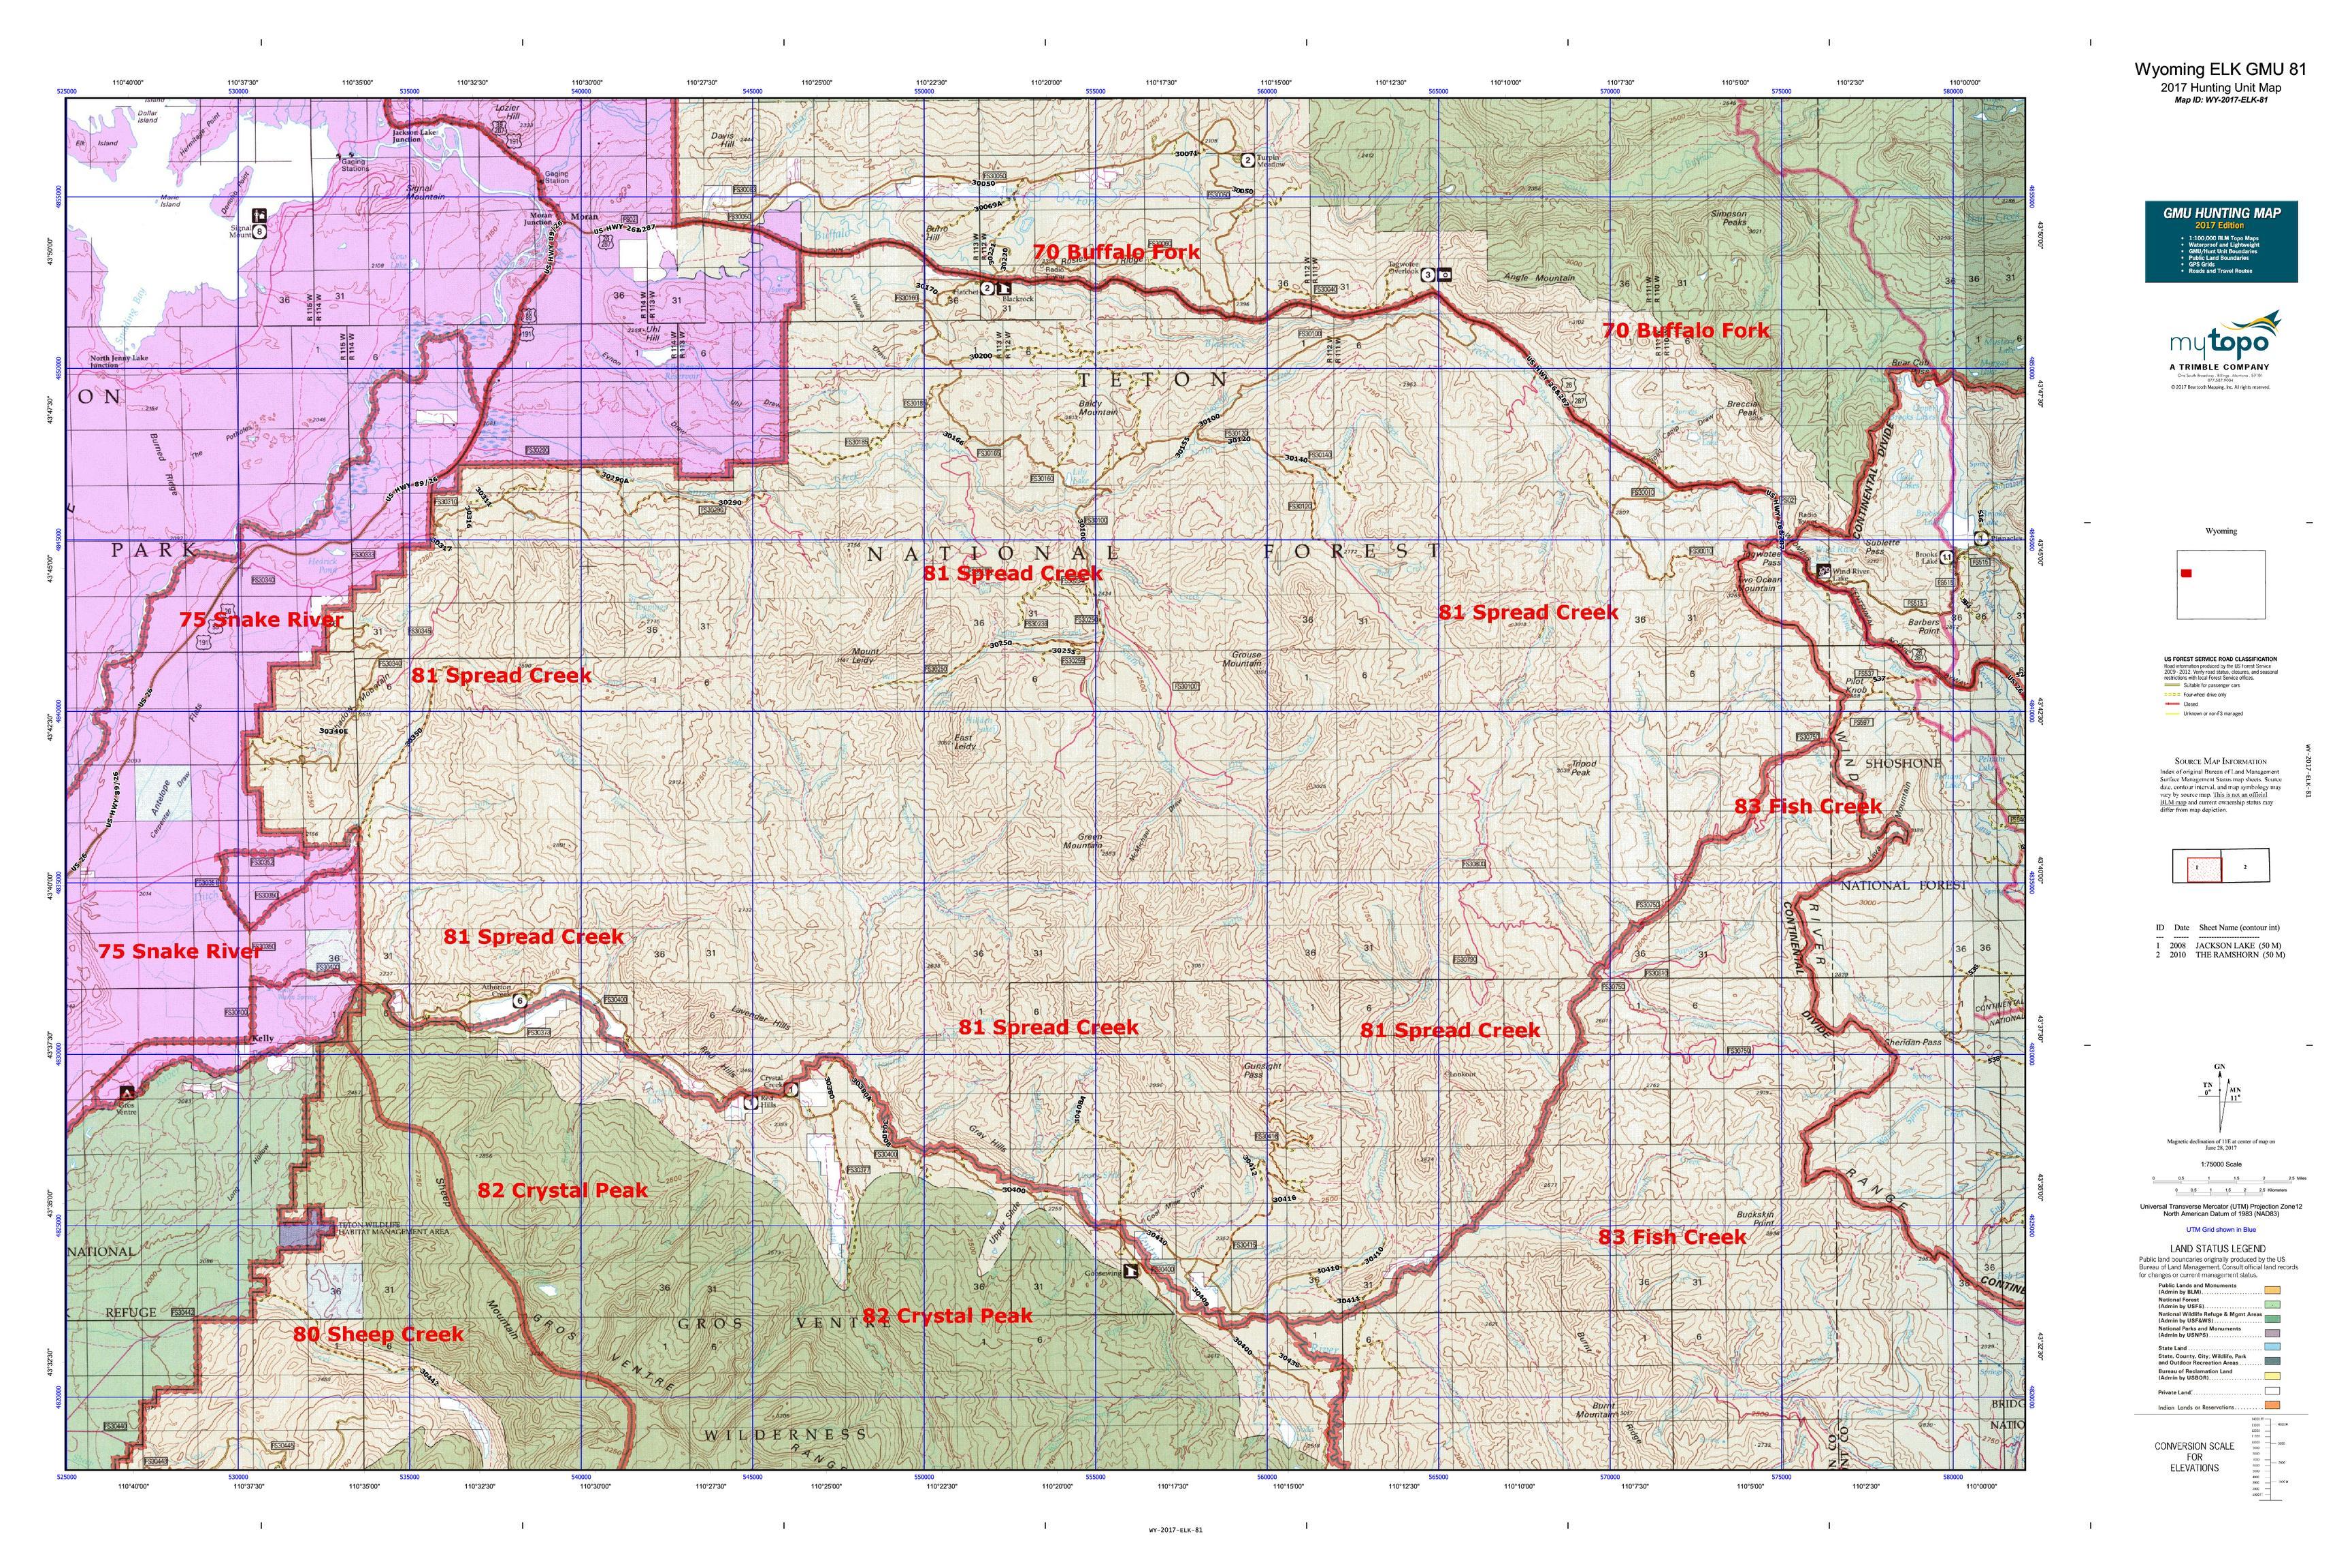 Wyoming ELK GMU Map MyTopo - Us map wyoming